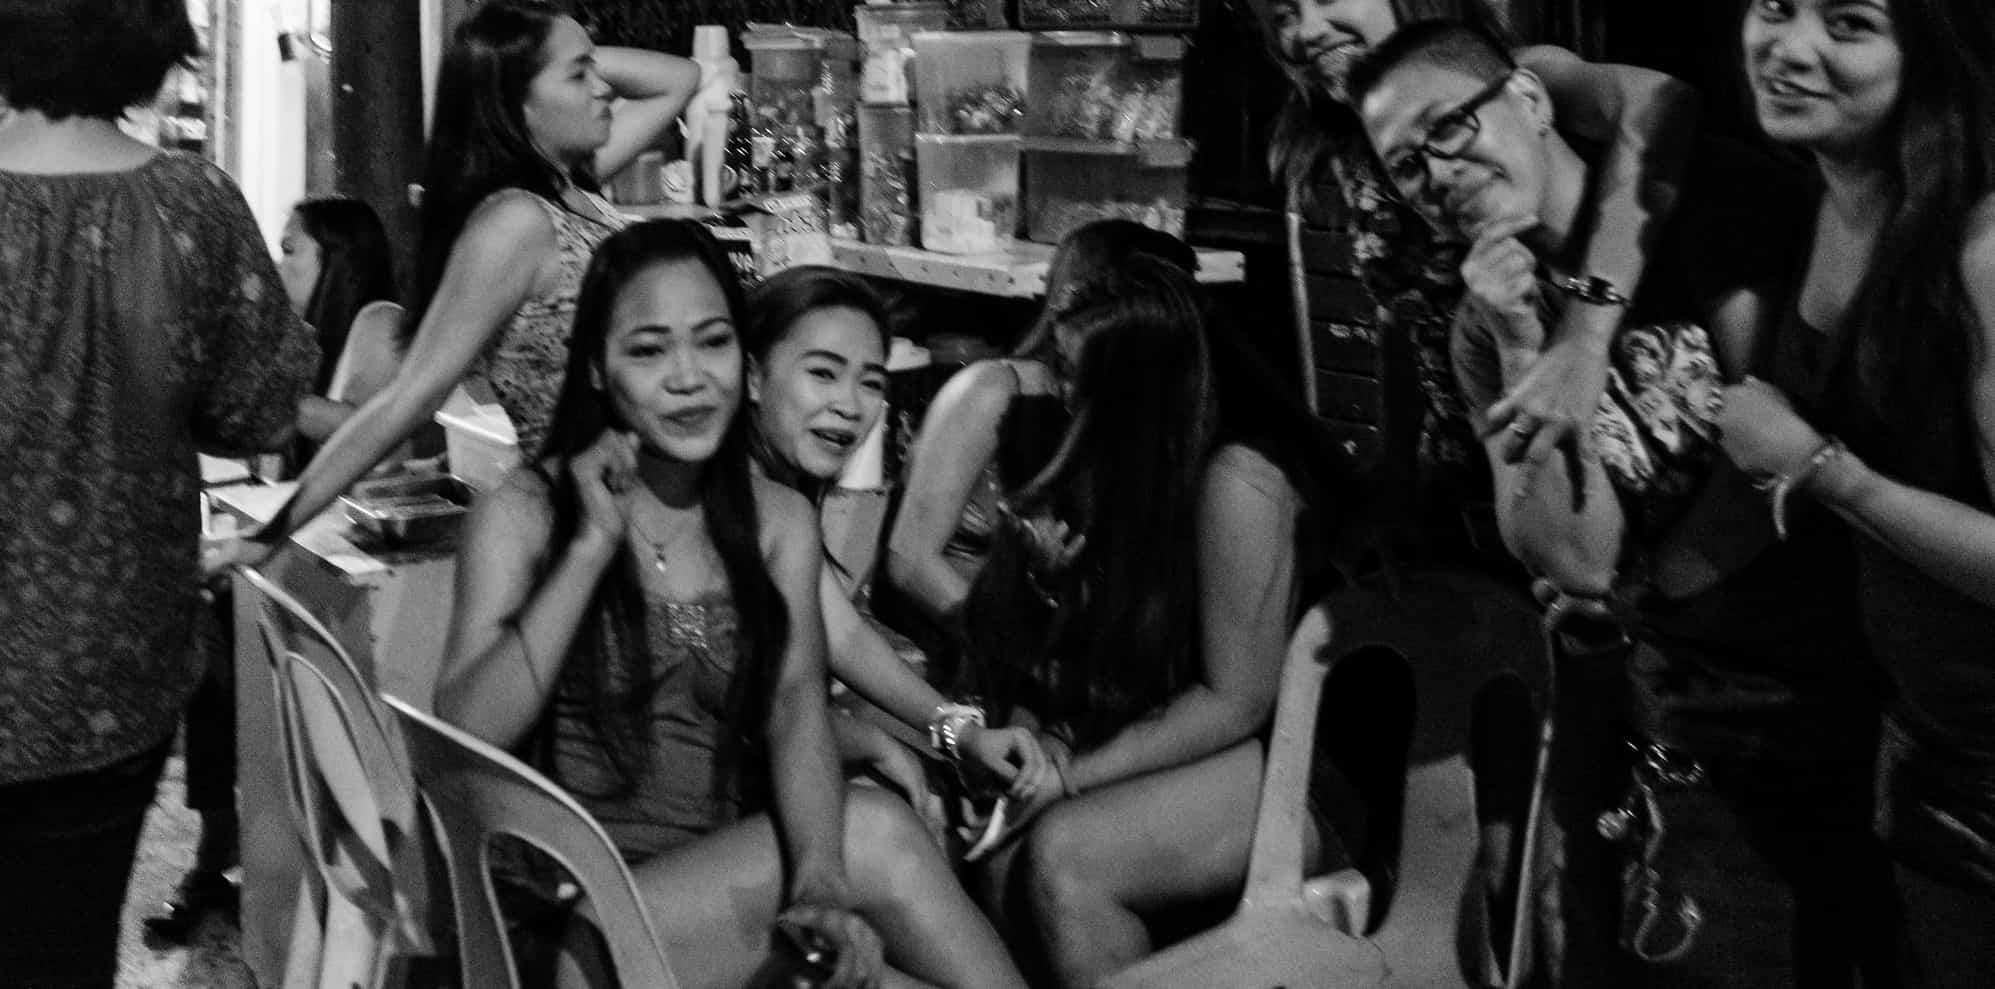 Manila bar girls, Where to Find the Best Bar Girls in Manila